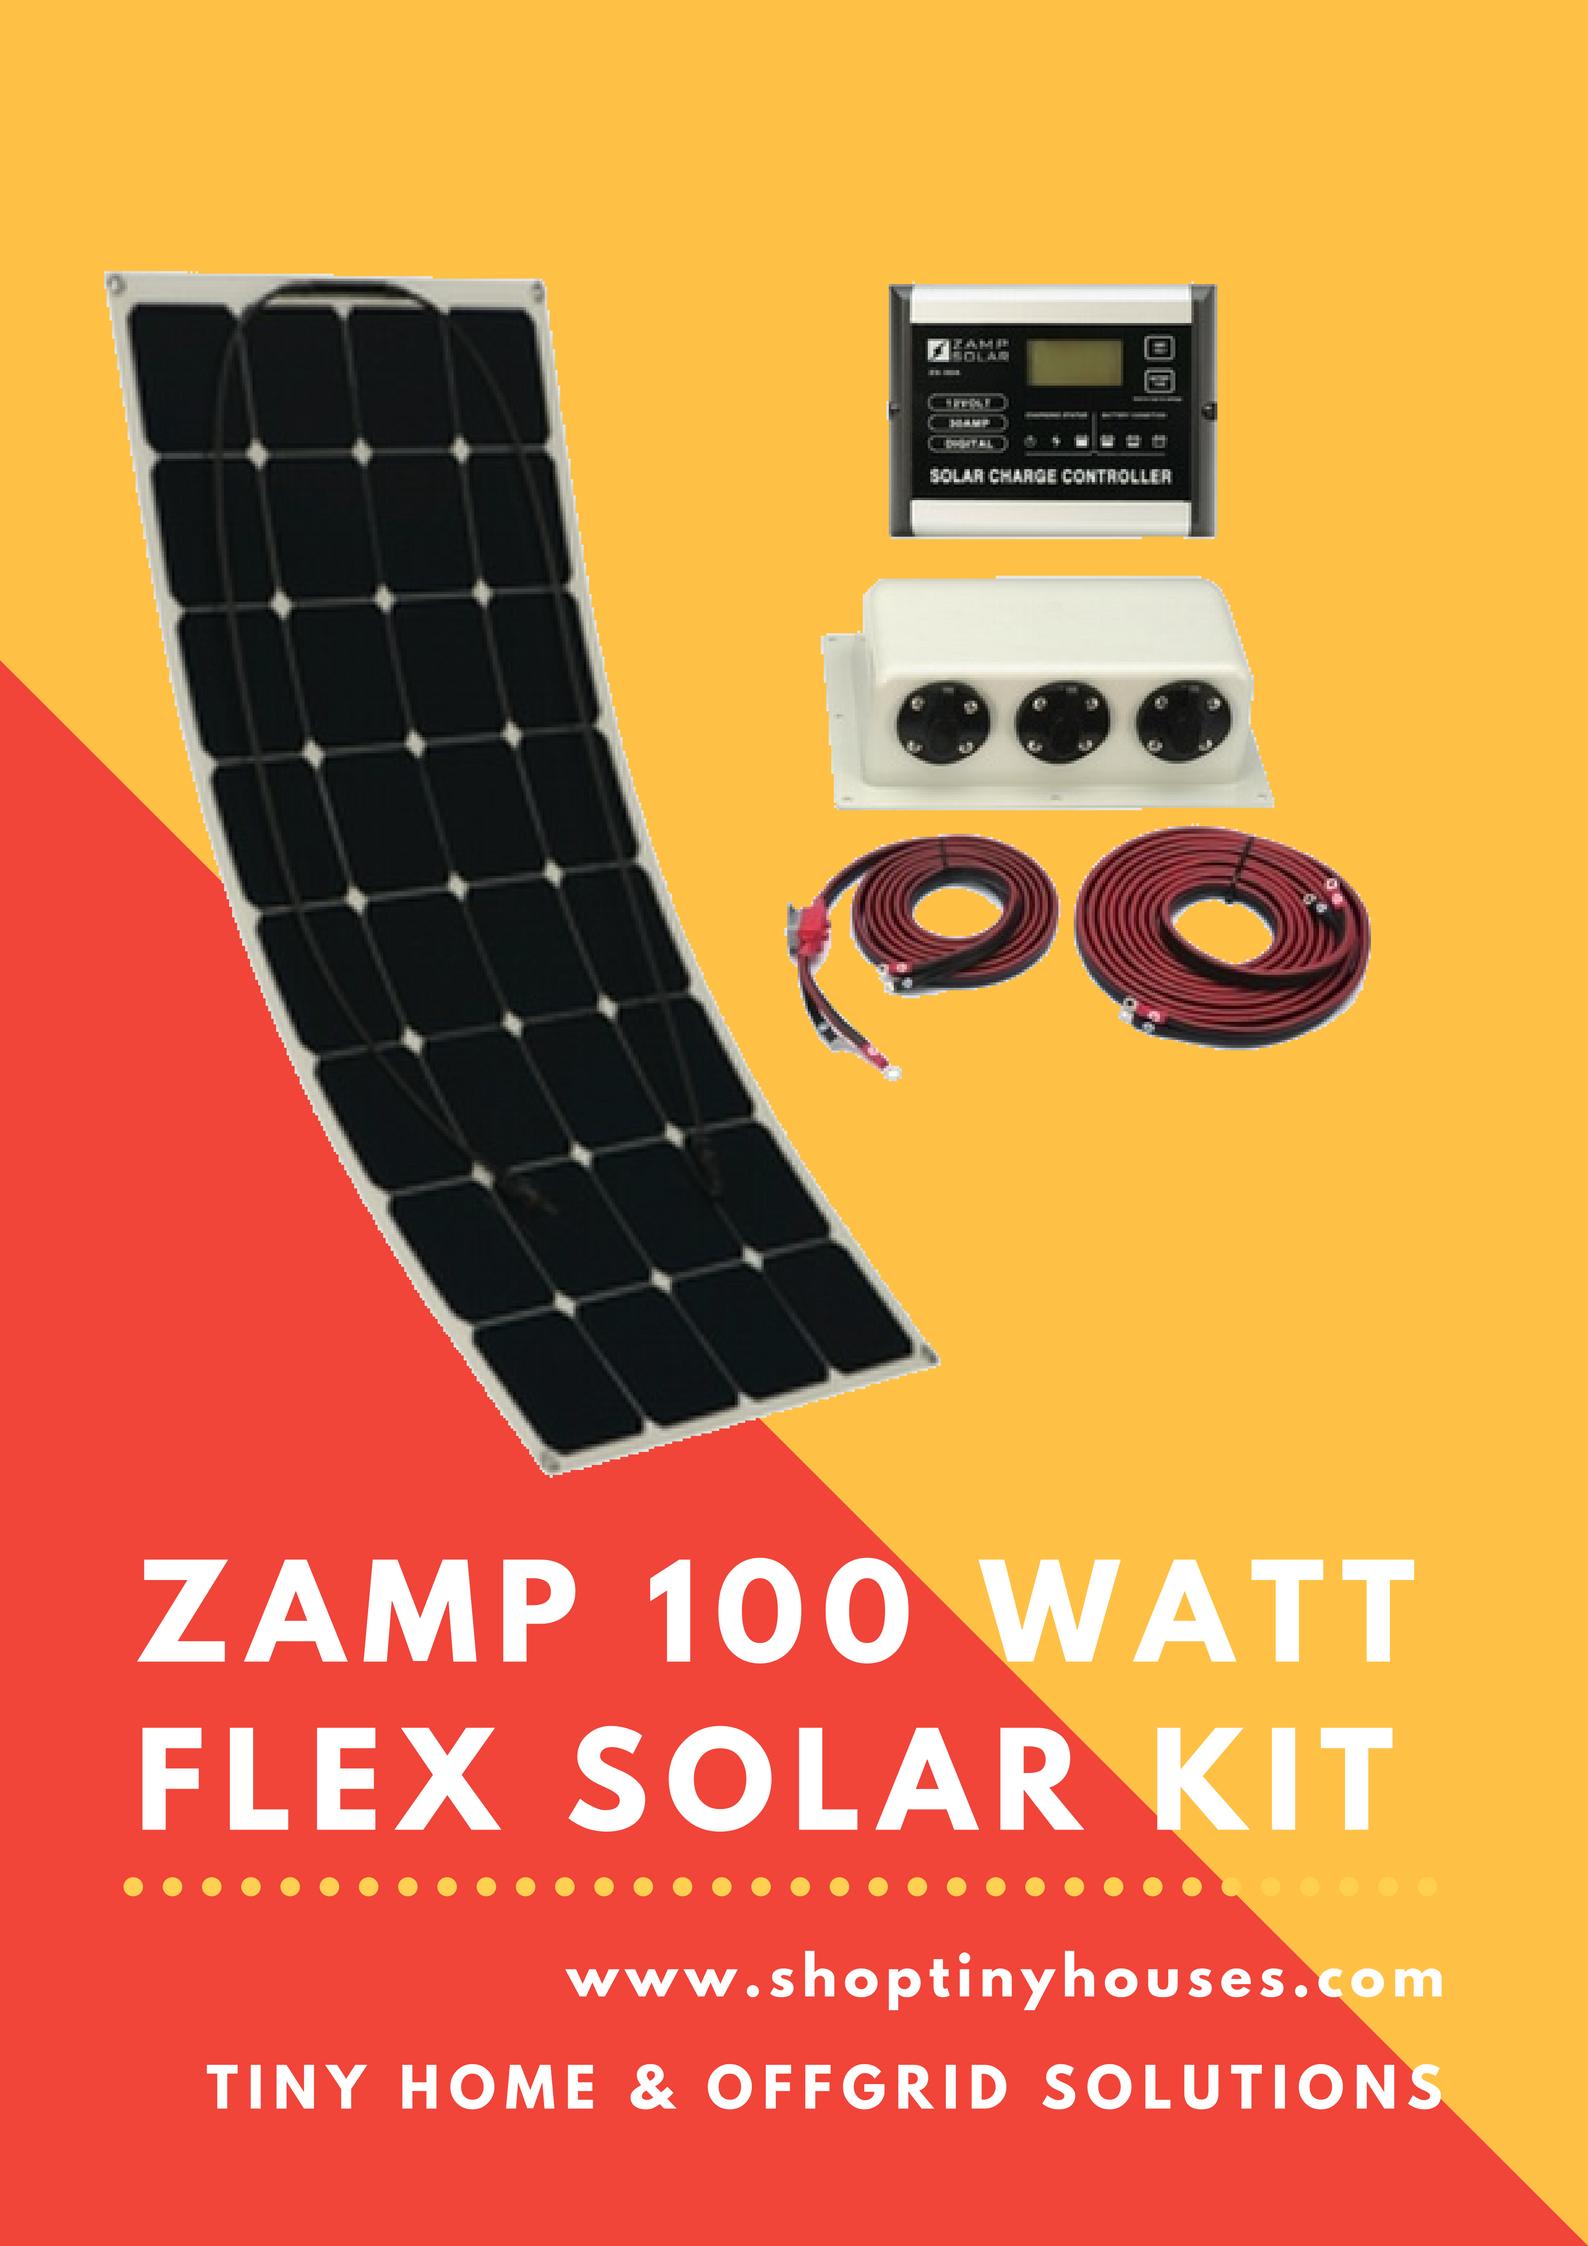 Zamp 100 Watt Flexi Deluxe Solar Kit Solar Panel System